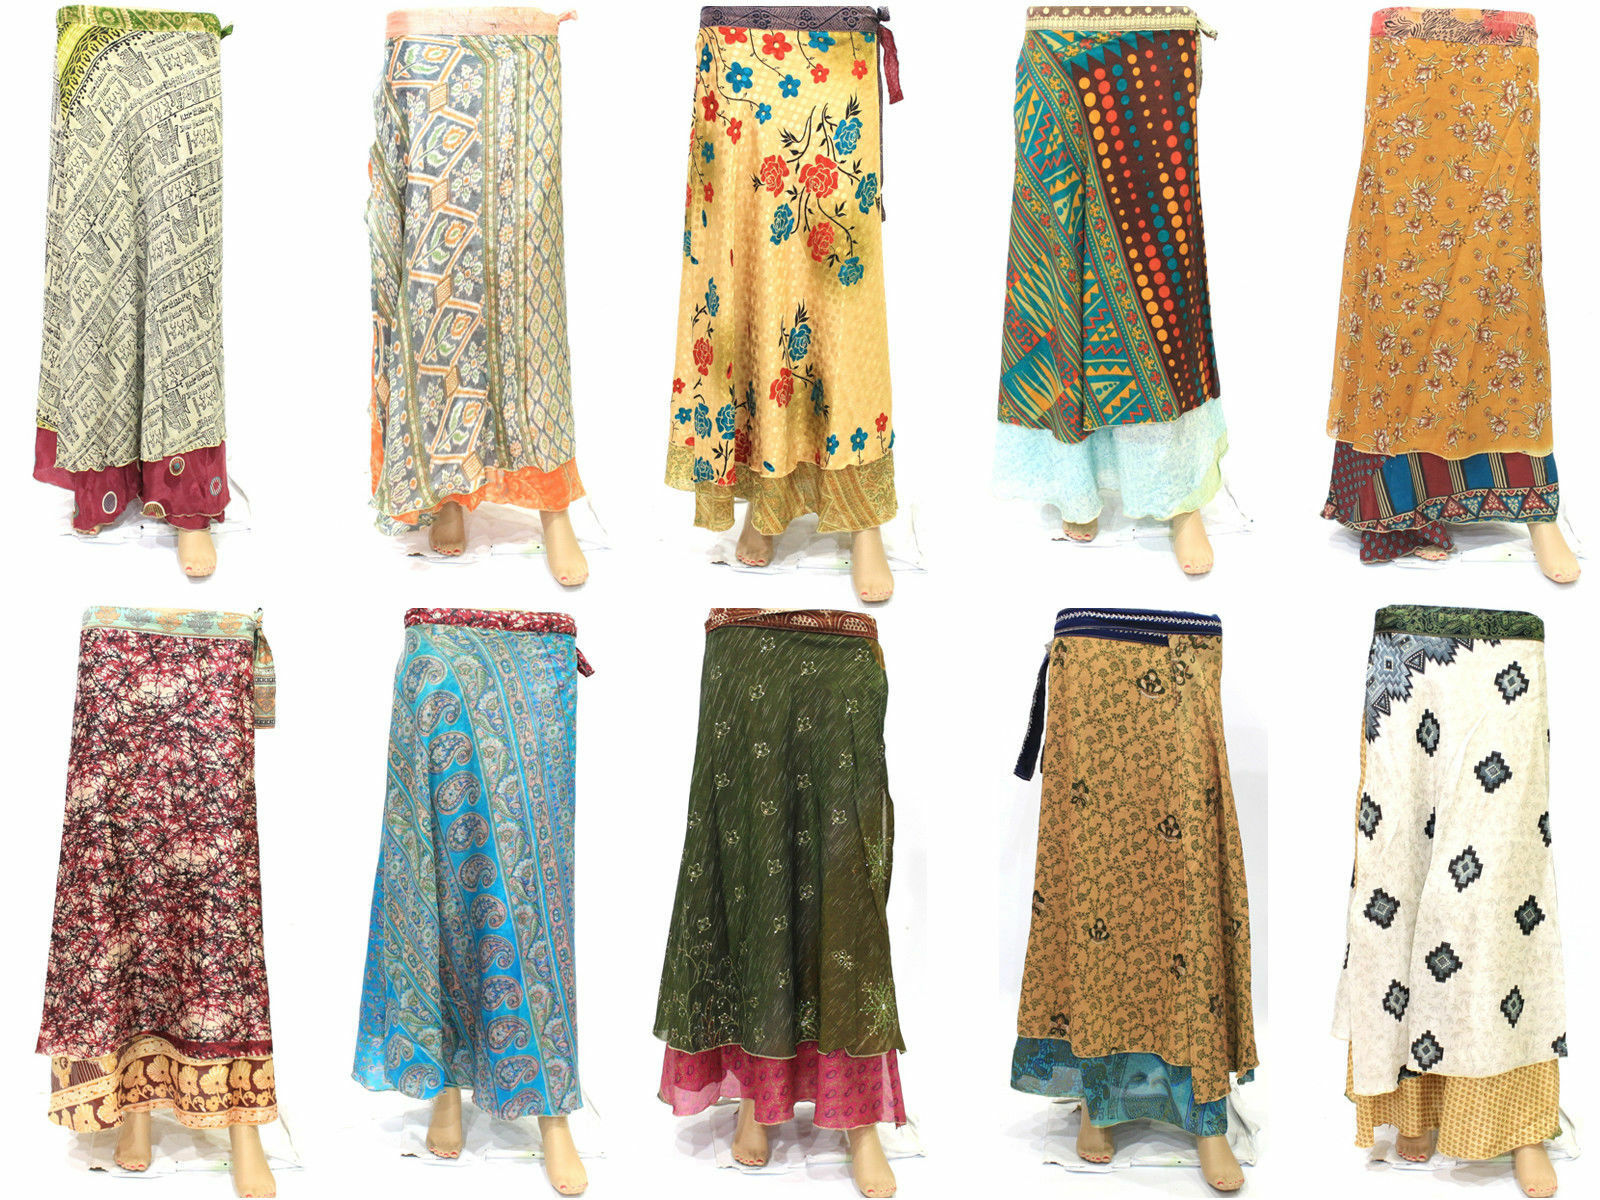 5 PC Vintage Silk Wrap Around Skirt Sari Magic Wrap Around Long Skirt Beach Wear